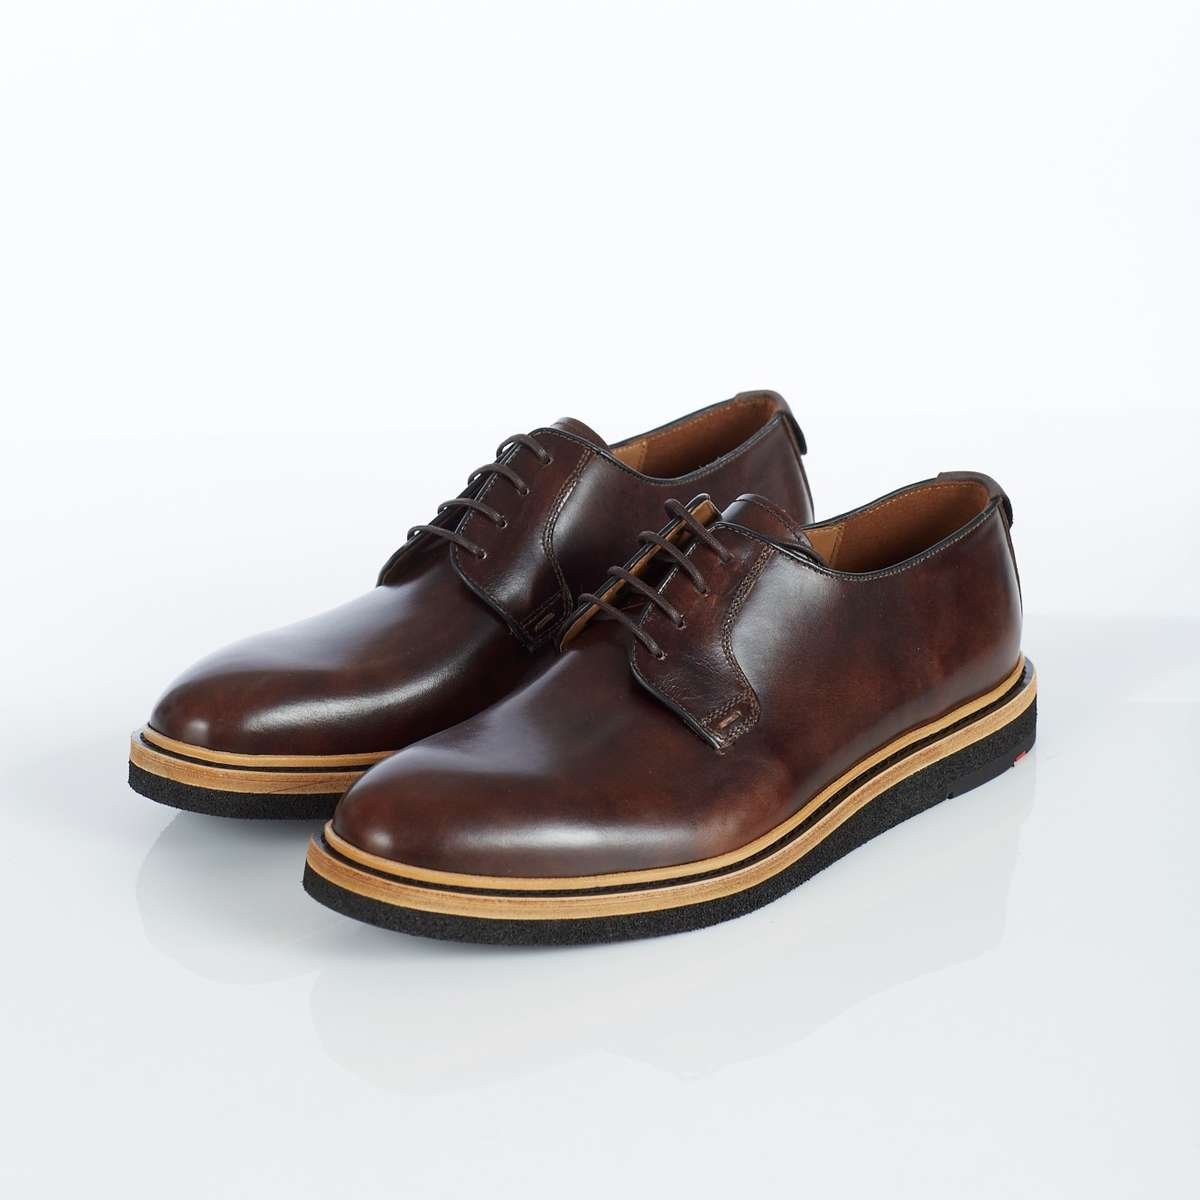 Lloyd Shoes 'Jannes' Macchiato Calf Derby Front